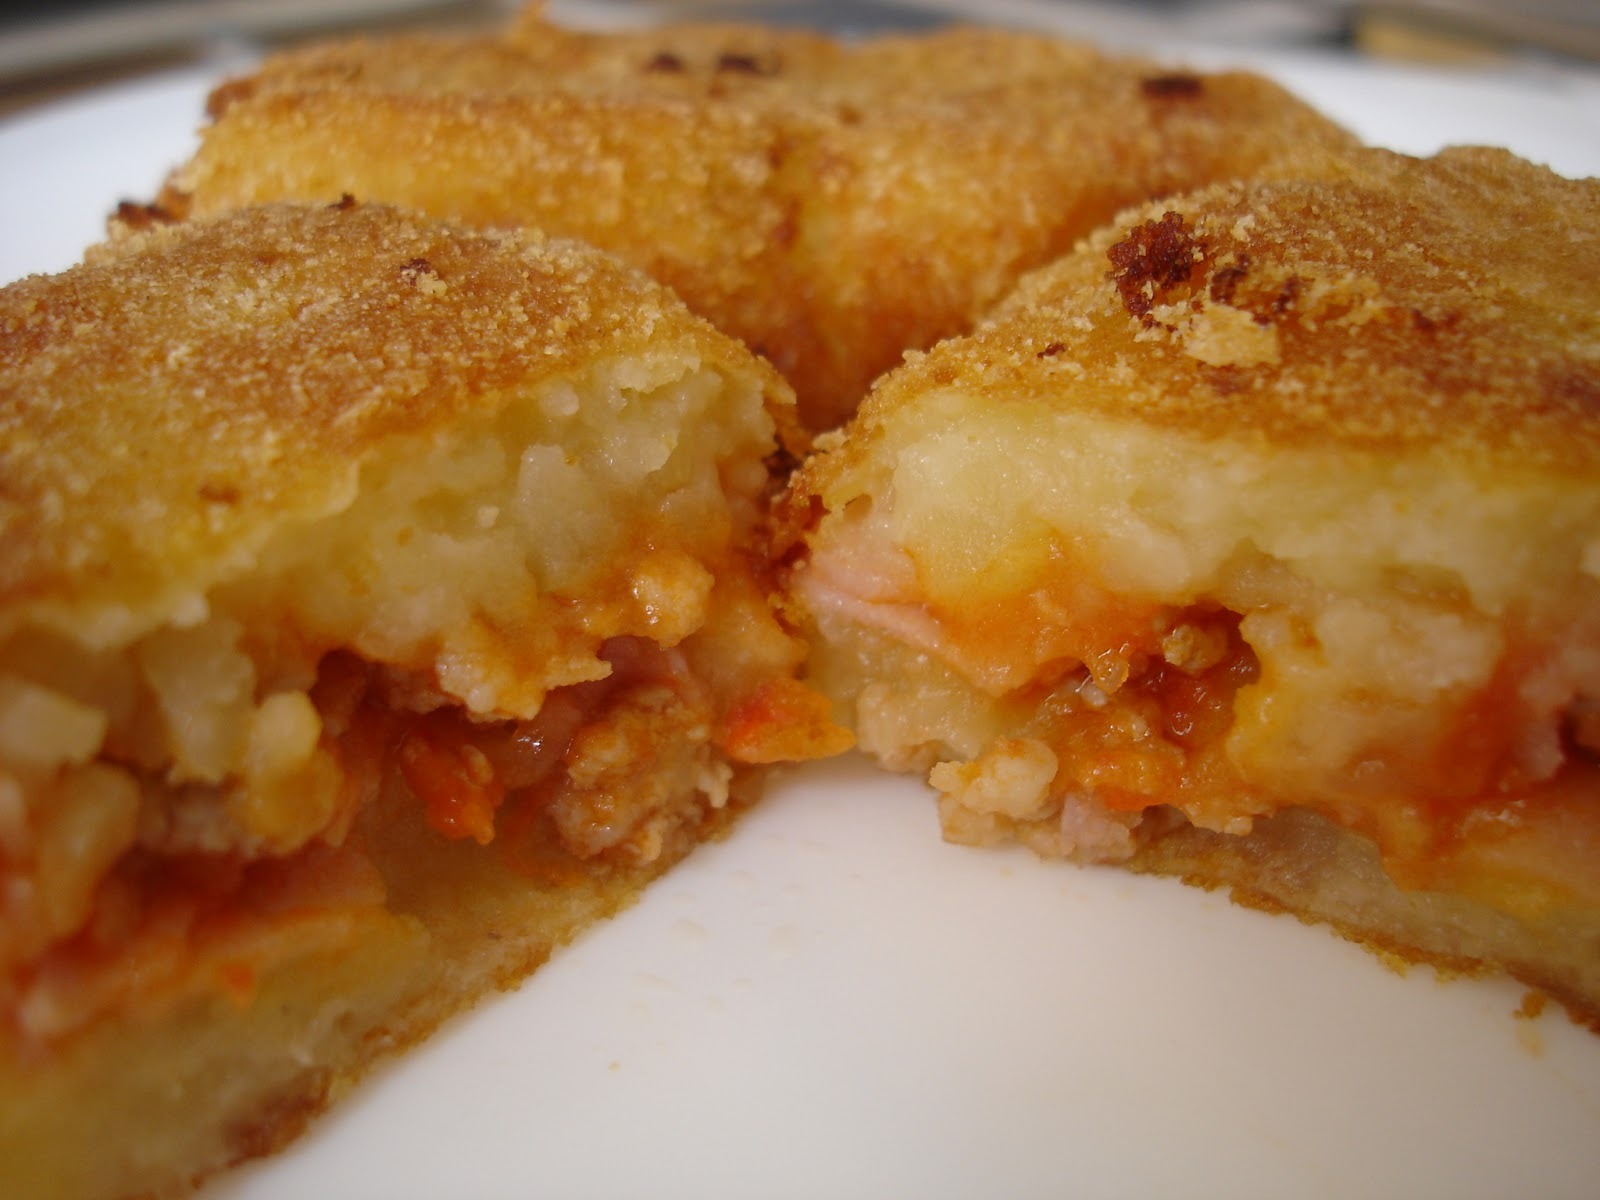 Cuinar i viatjar receta para cocinar con ni os patatas for Cocinar repollo con patatas